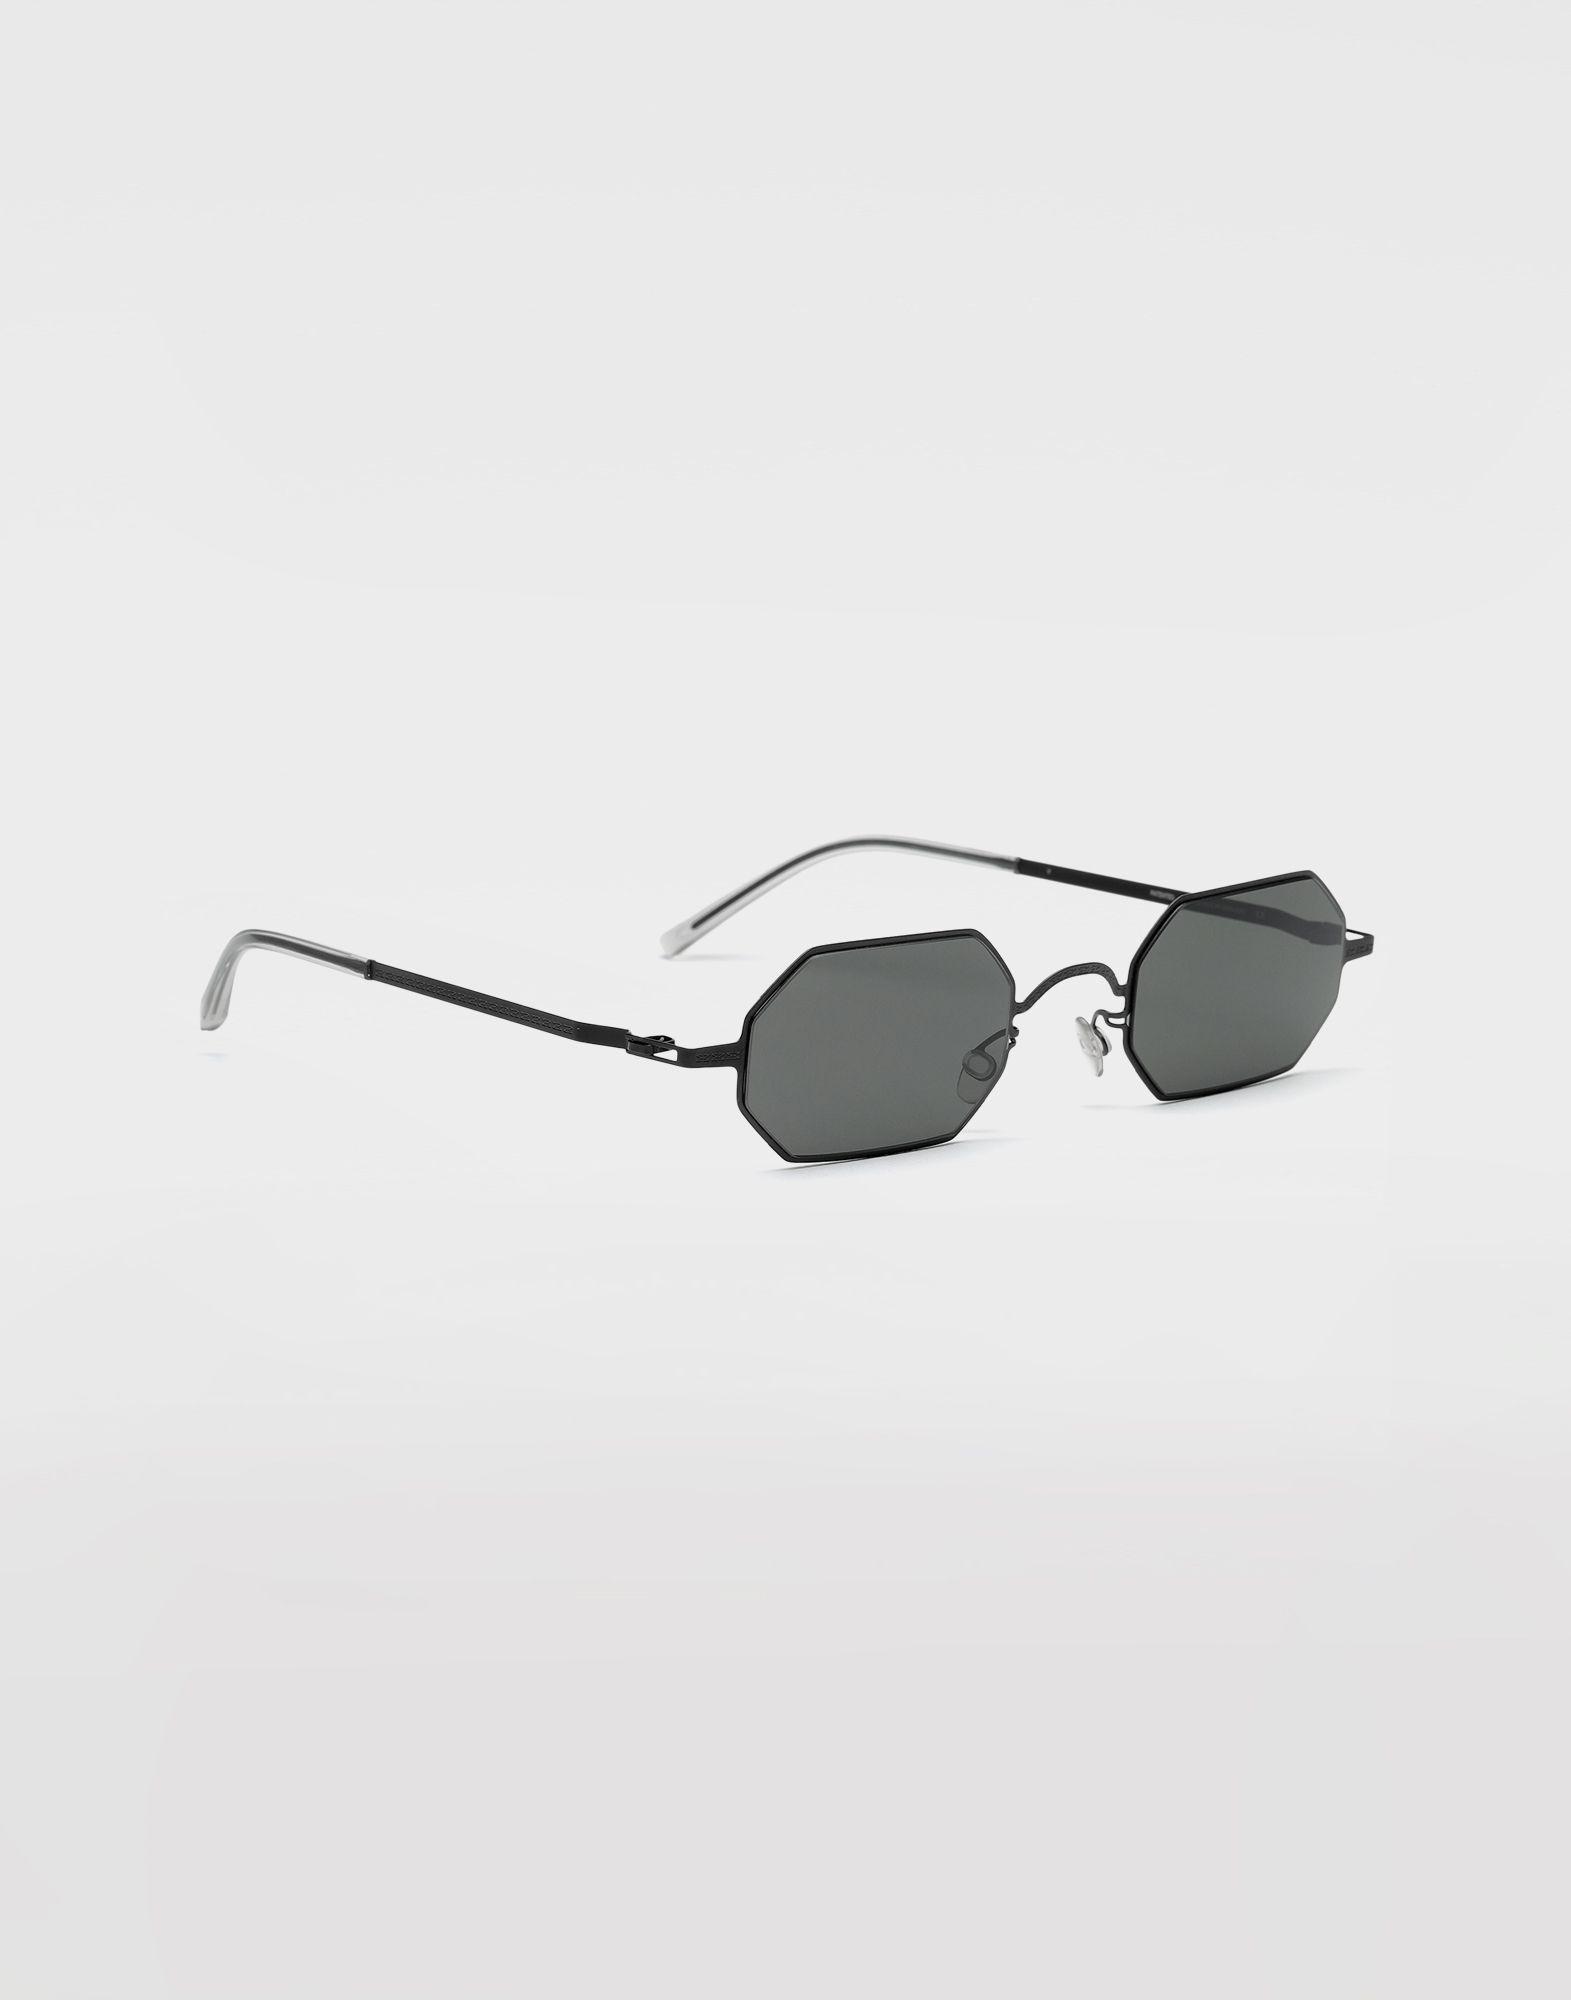 MAISON MARGIELA MYKITA + Maison Margiela 'CRAFT' Eyewear E r